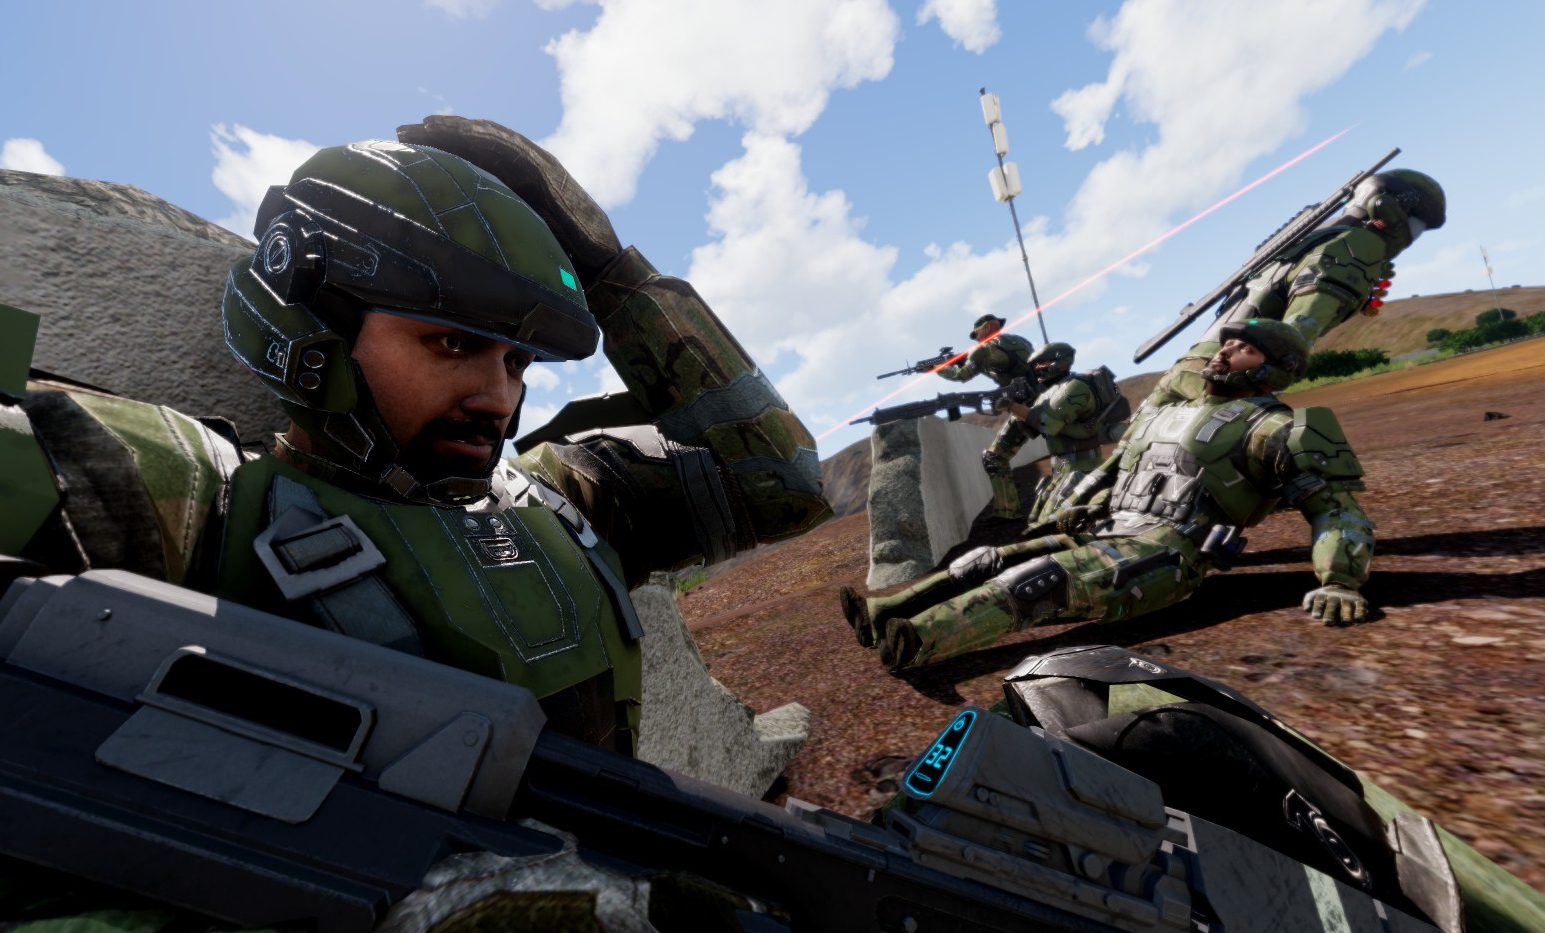 Operation: Trebuchet, a Halo mod for Arma 3, has an impressive new